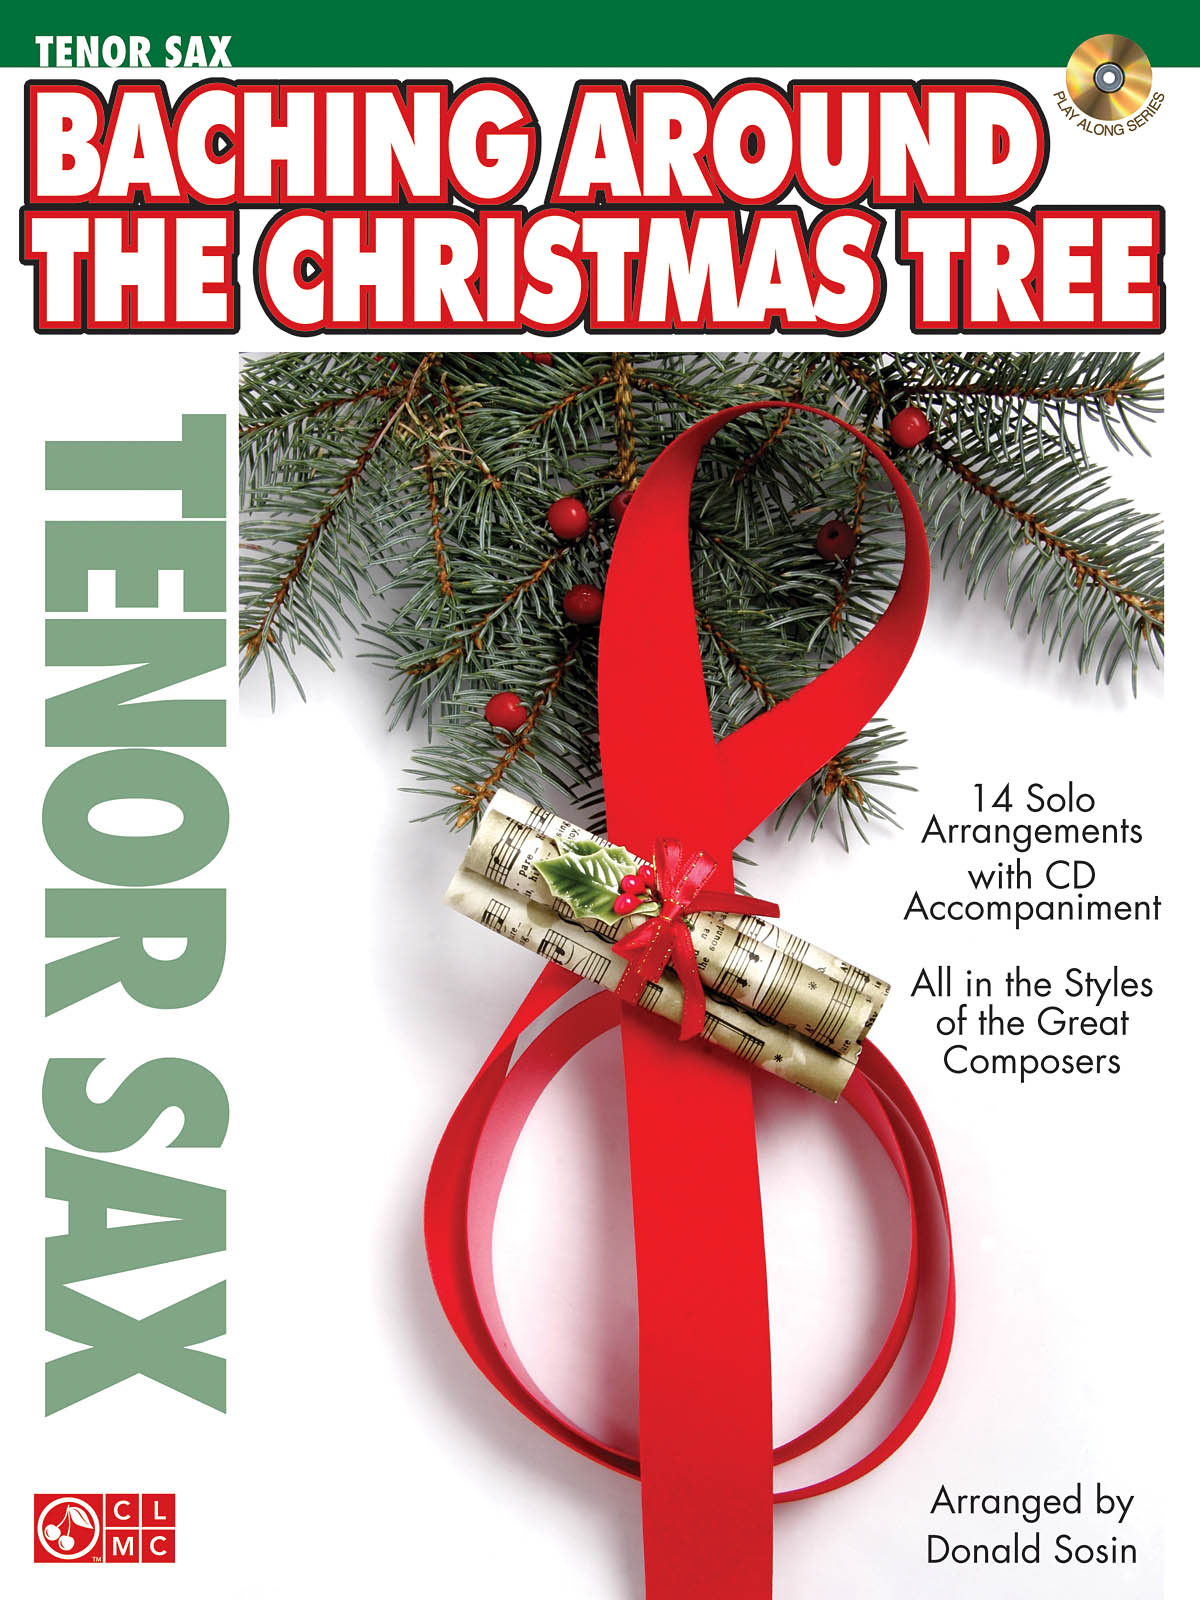 Baching Around the Christmas Tree - Tenor Sax: Tenor Saxophone: Backing Tracks